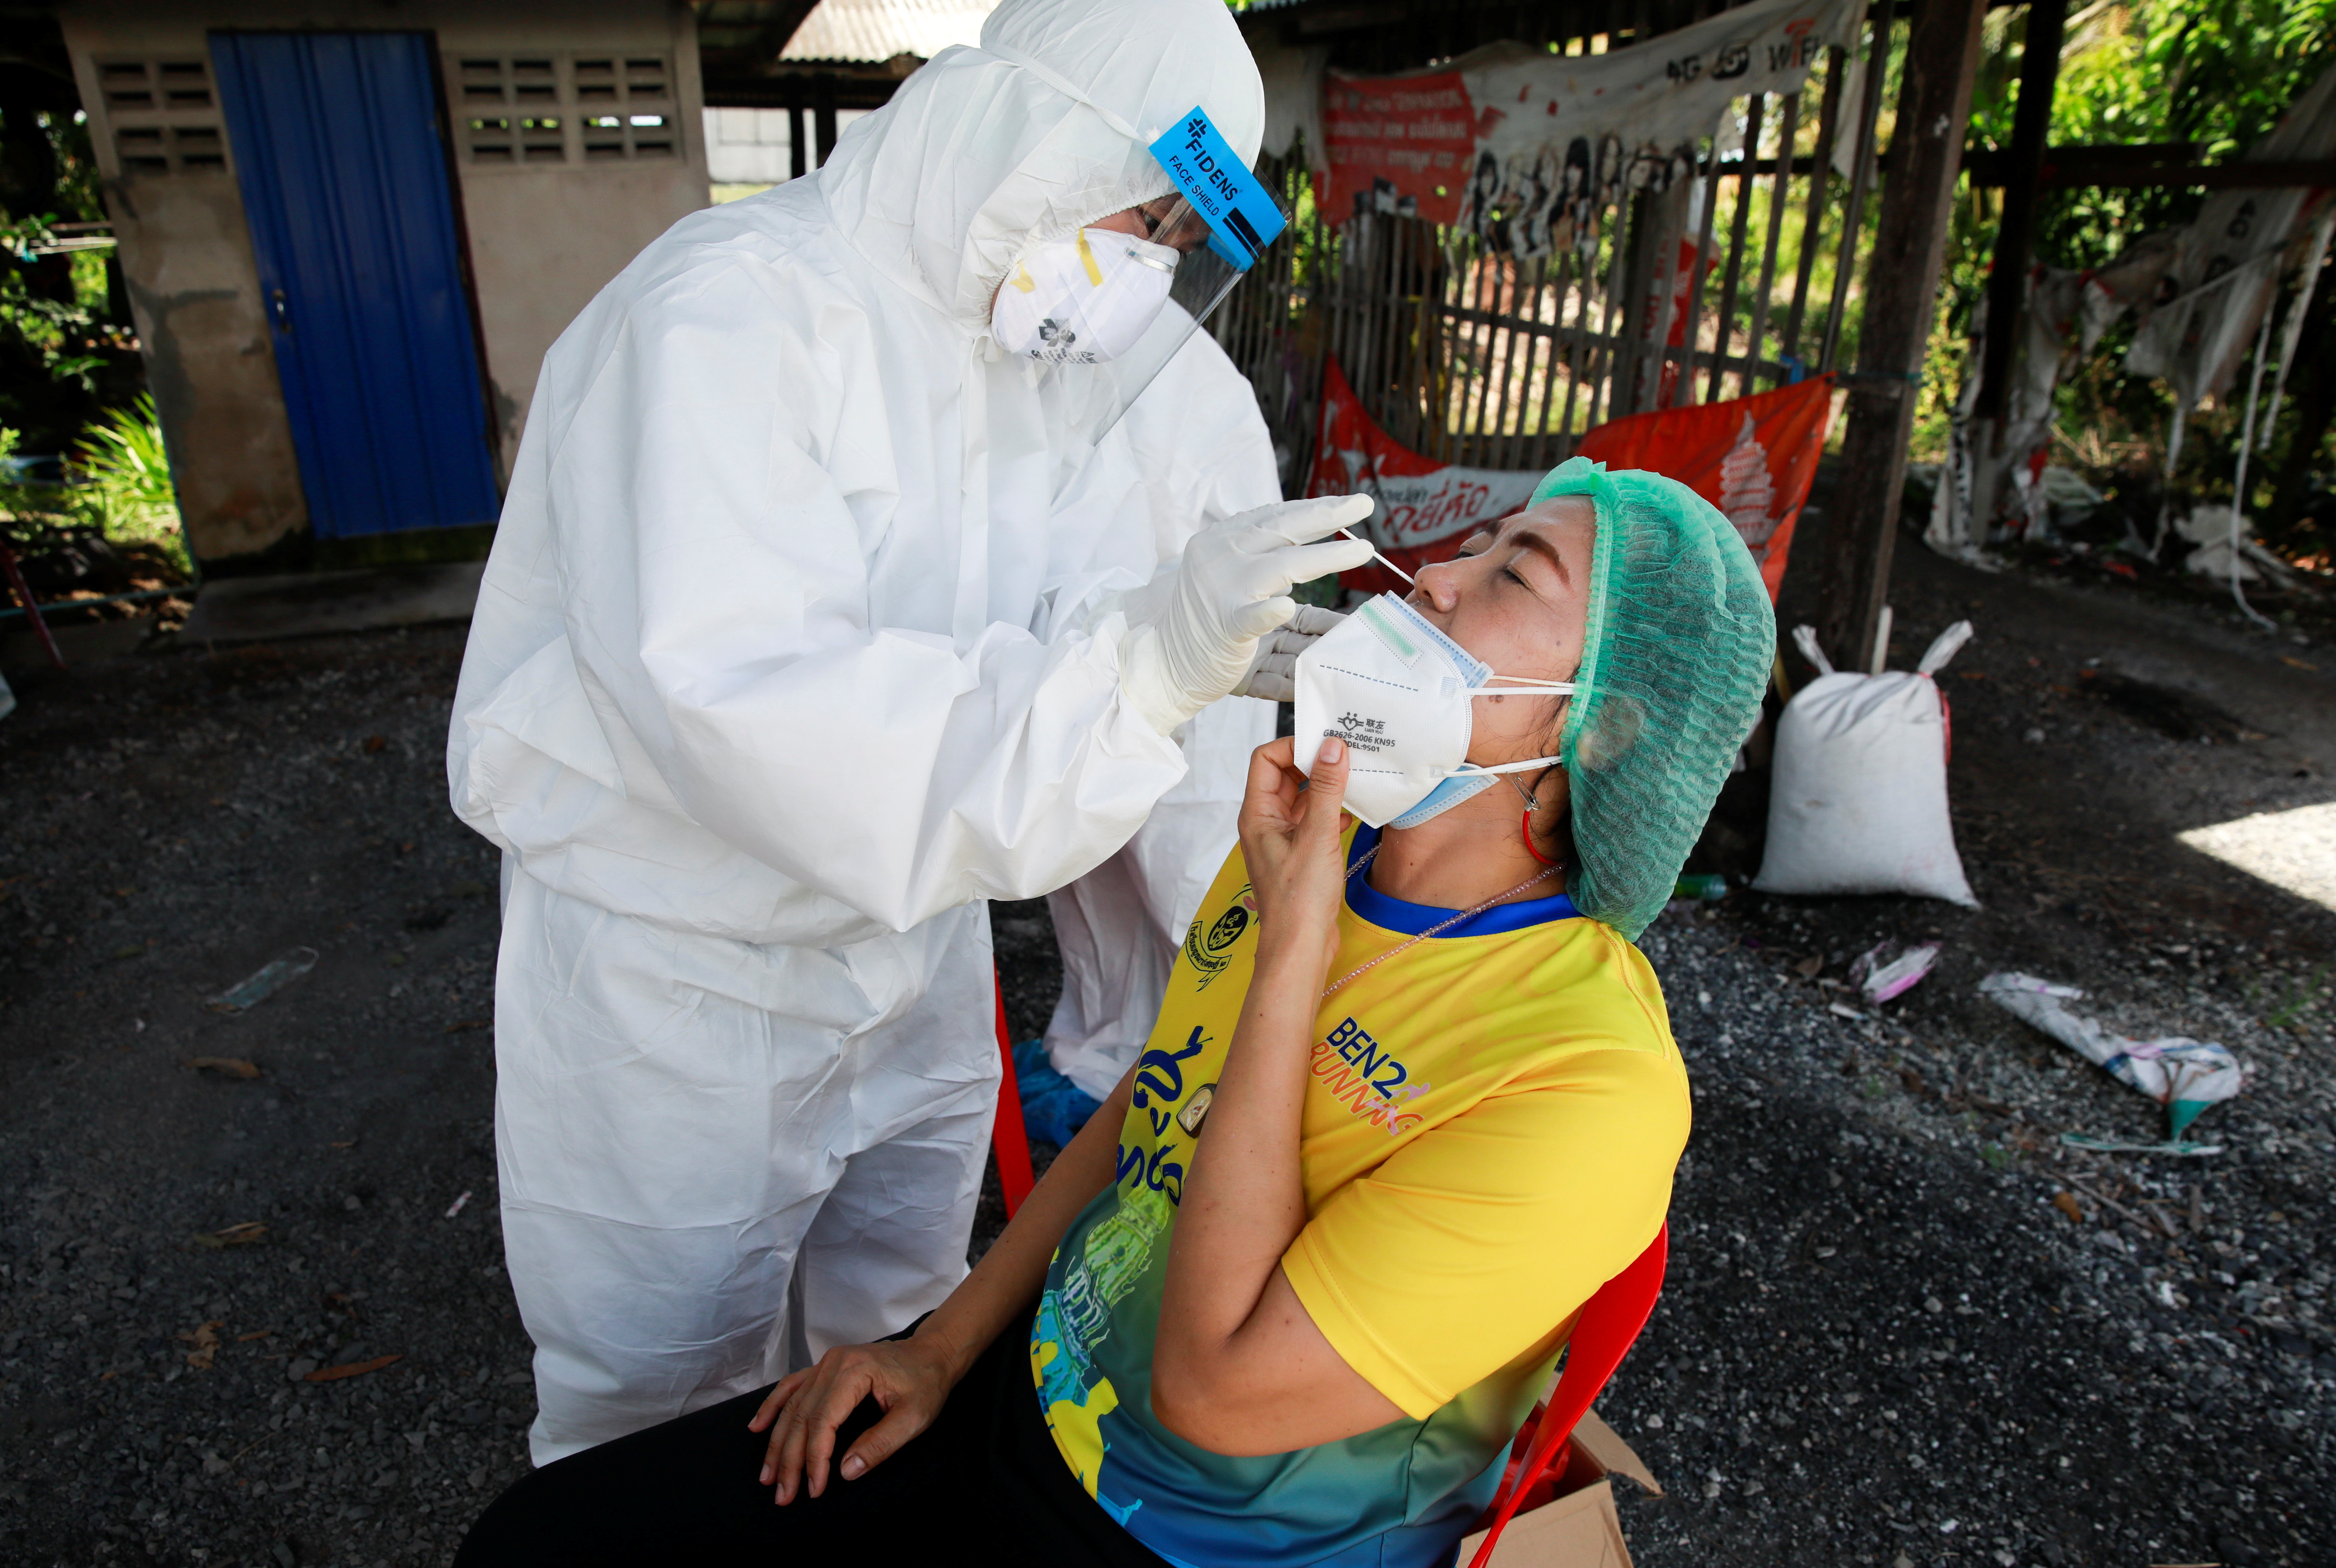 Public health officers bring coronavirus disease (COVID-19) swab testing to residents living in remote communities, amid the rise of coronavirus disease infections, in Samut Prakan, near Bangkok, Thailand, July 19, 2021. REUTERS/Soe Zeya Tun